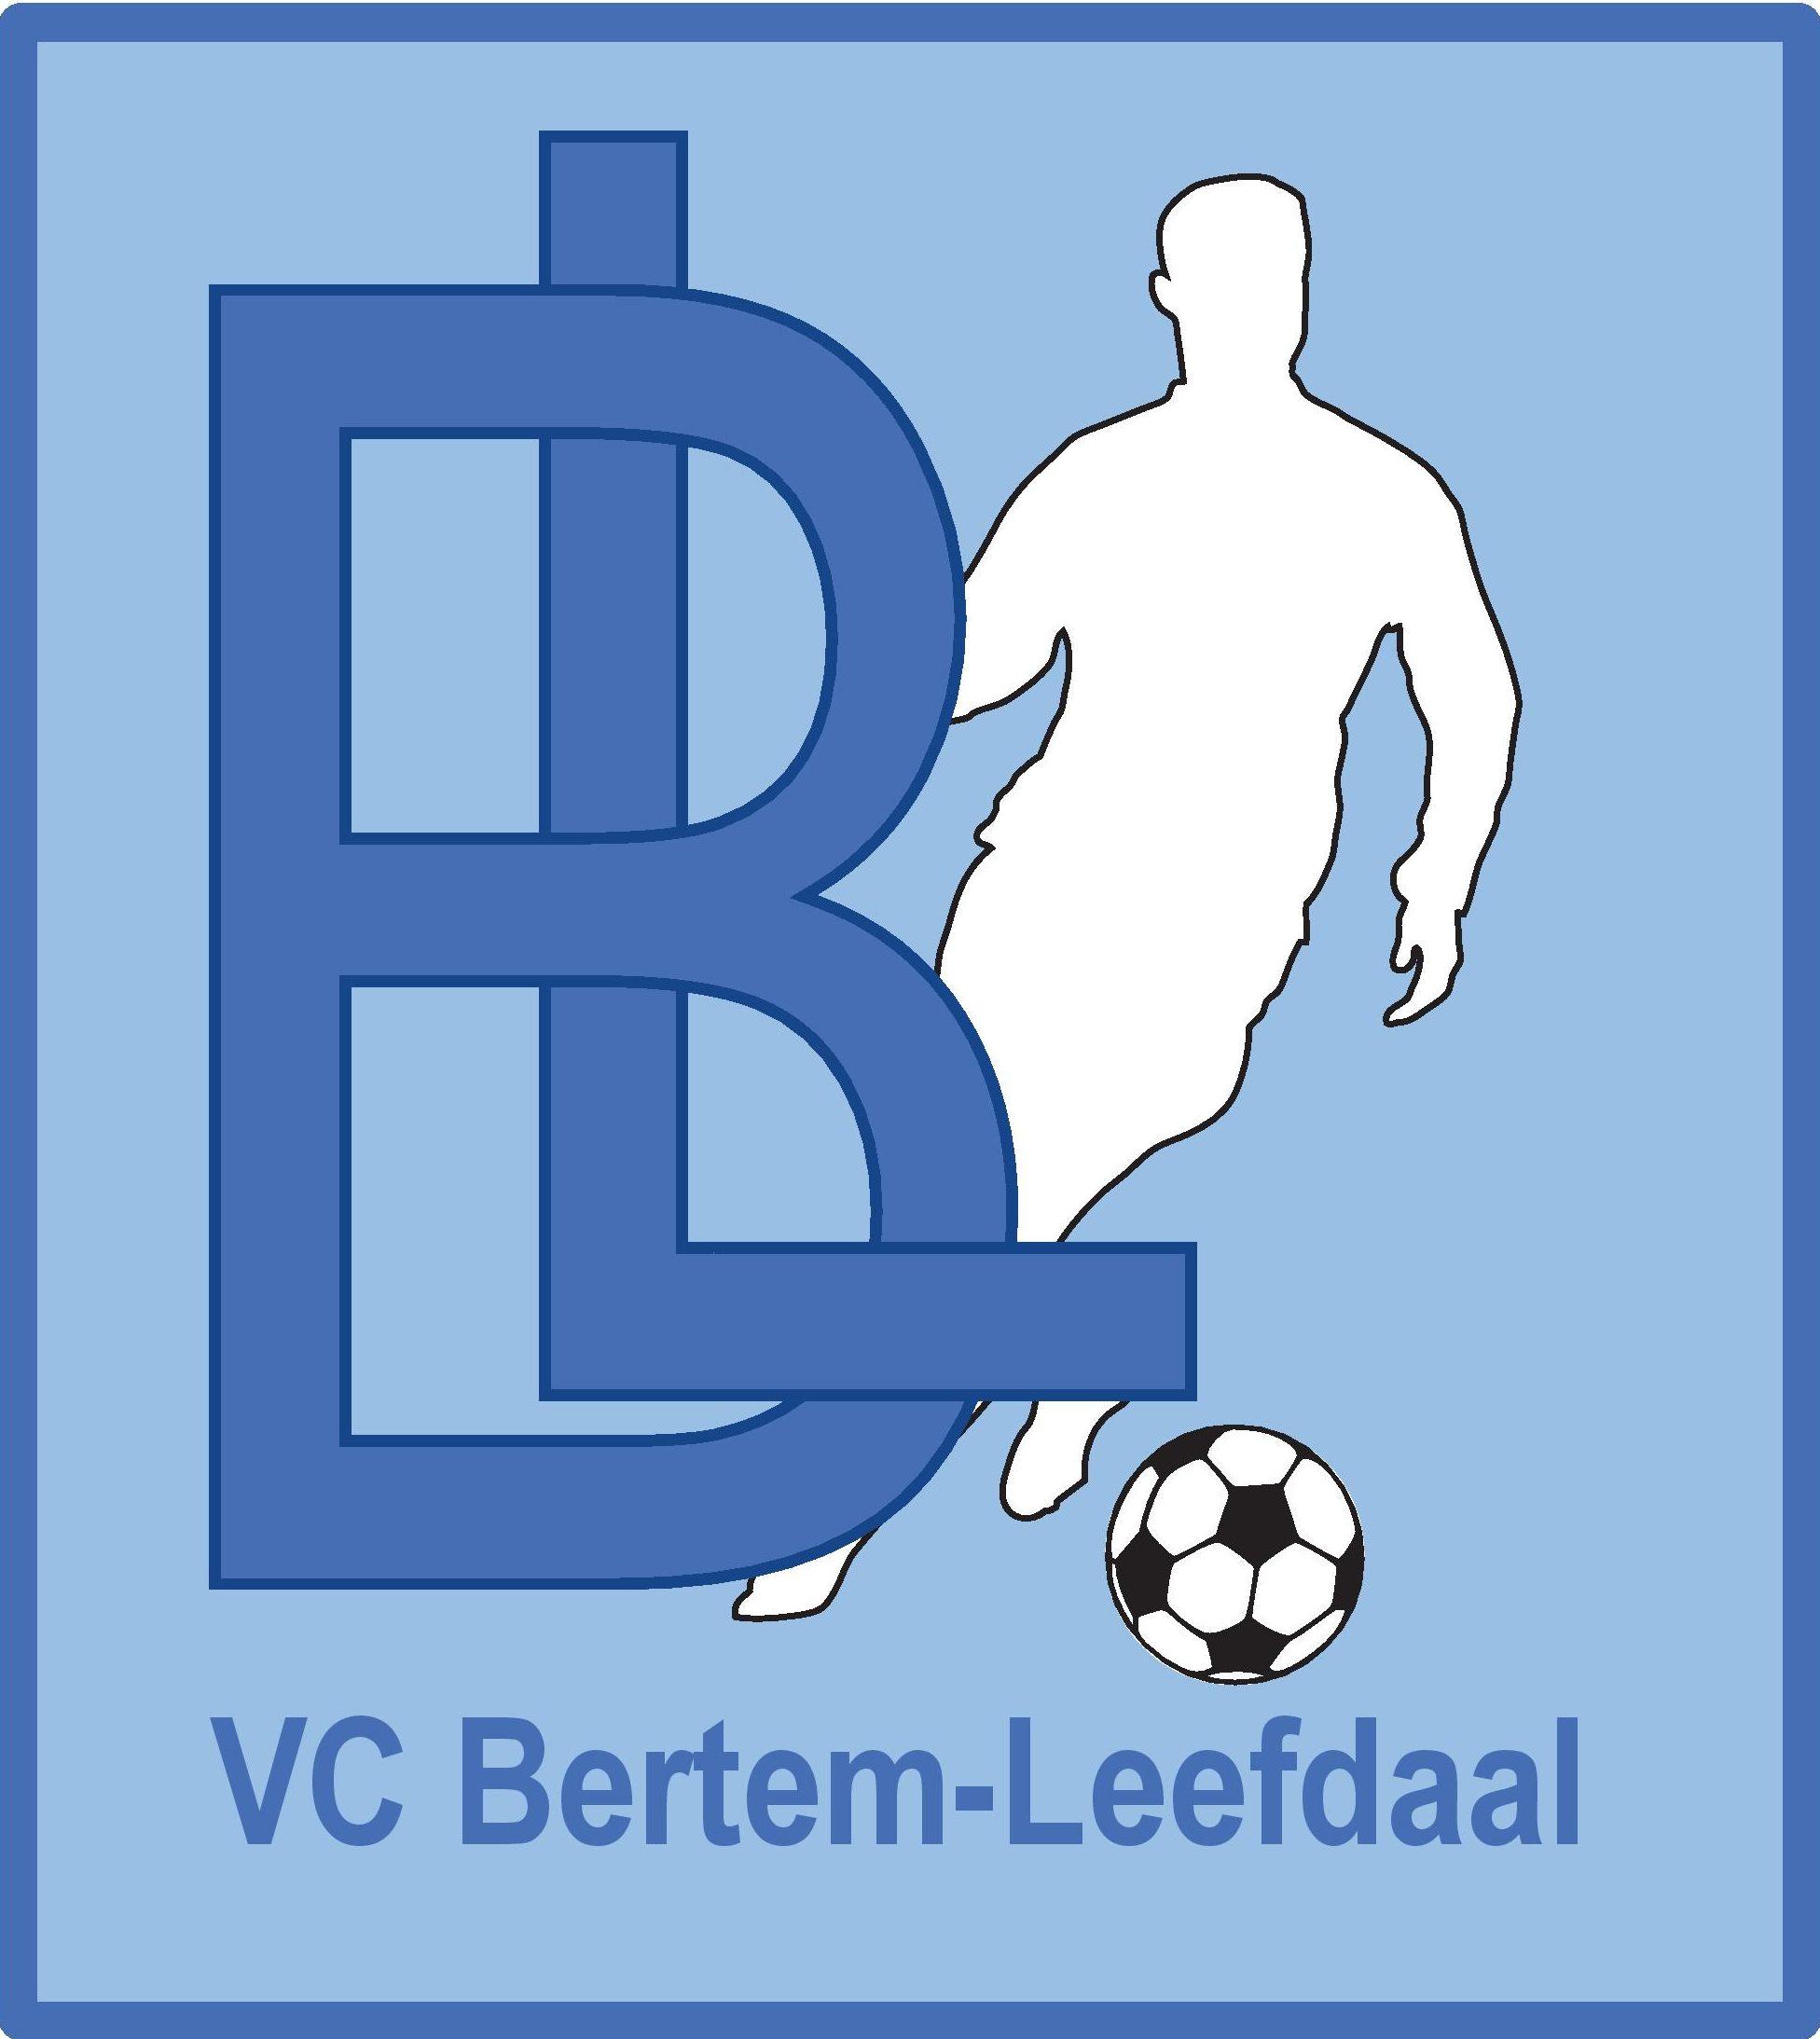 VC.BERTEM-LEEFDAAL A